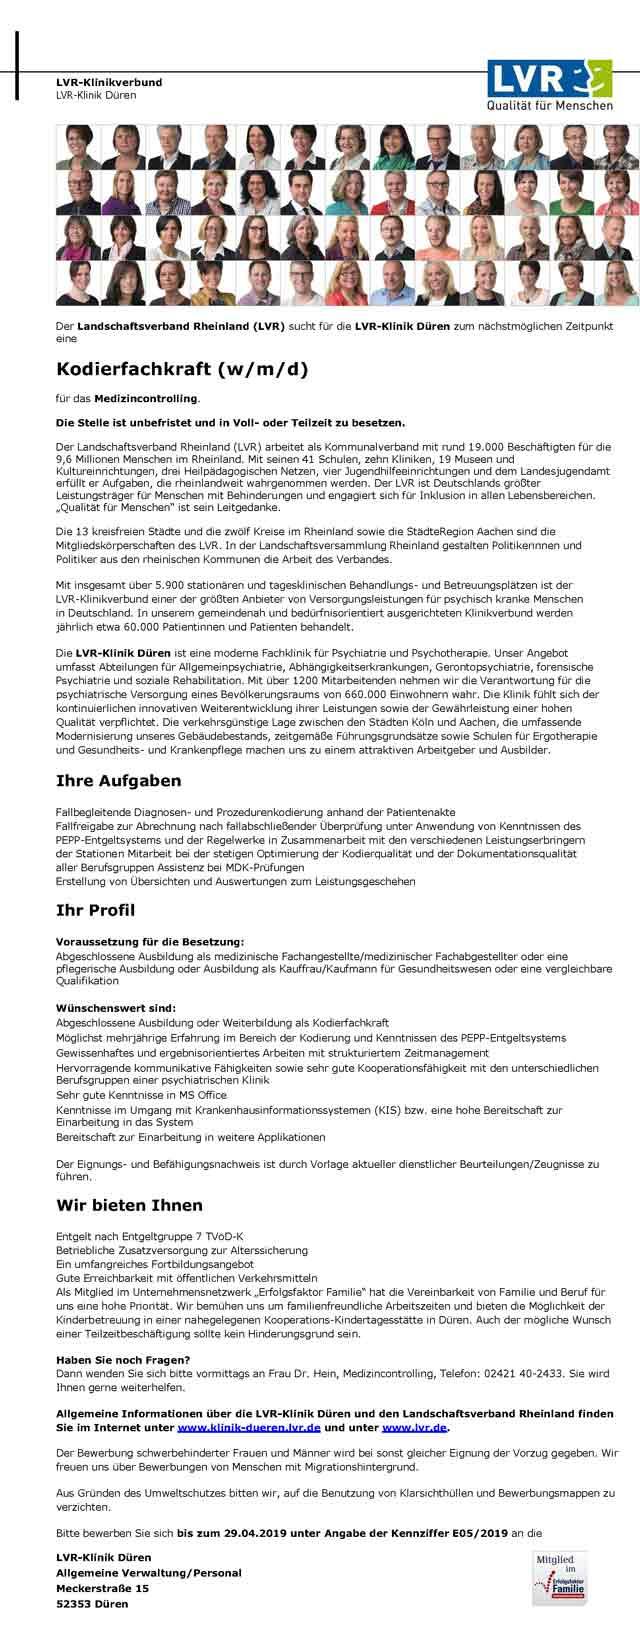 LVR-Klinik Düren: Kodierfachkraft (m/w/d)